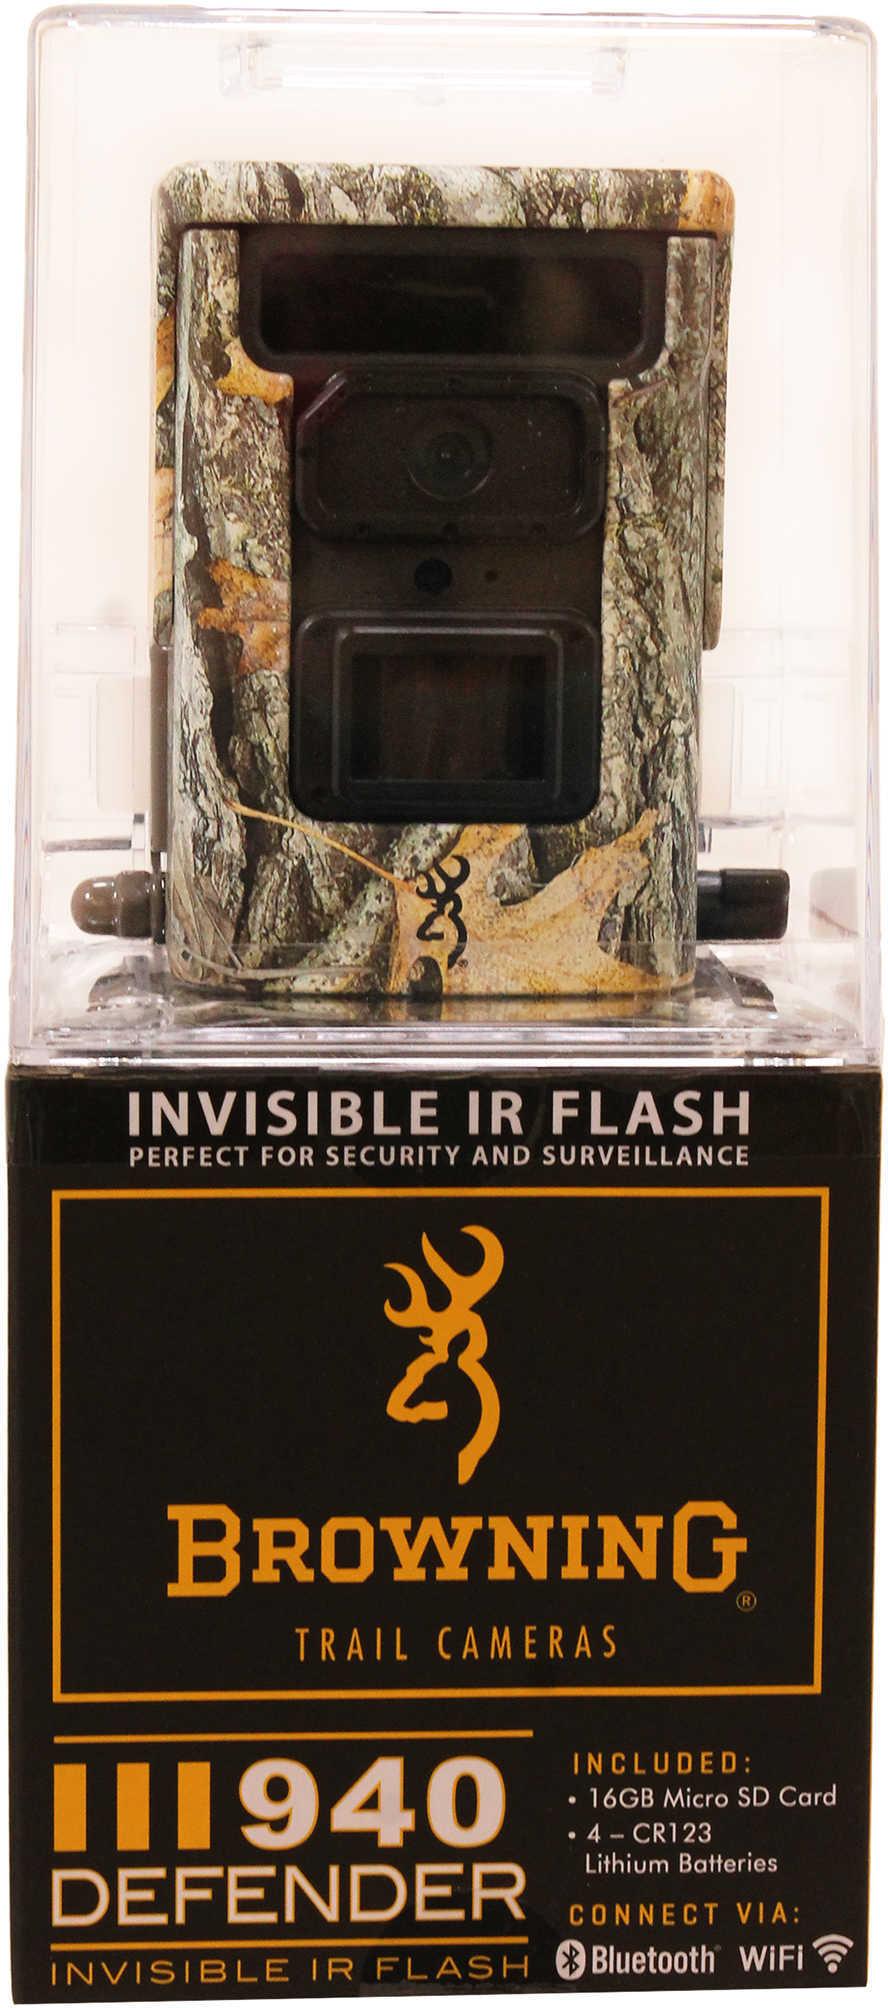 Browning Trail Cameras Trail Camera Defender 940, 20MP Md: BTC 10D